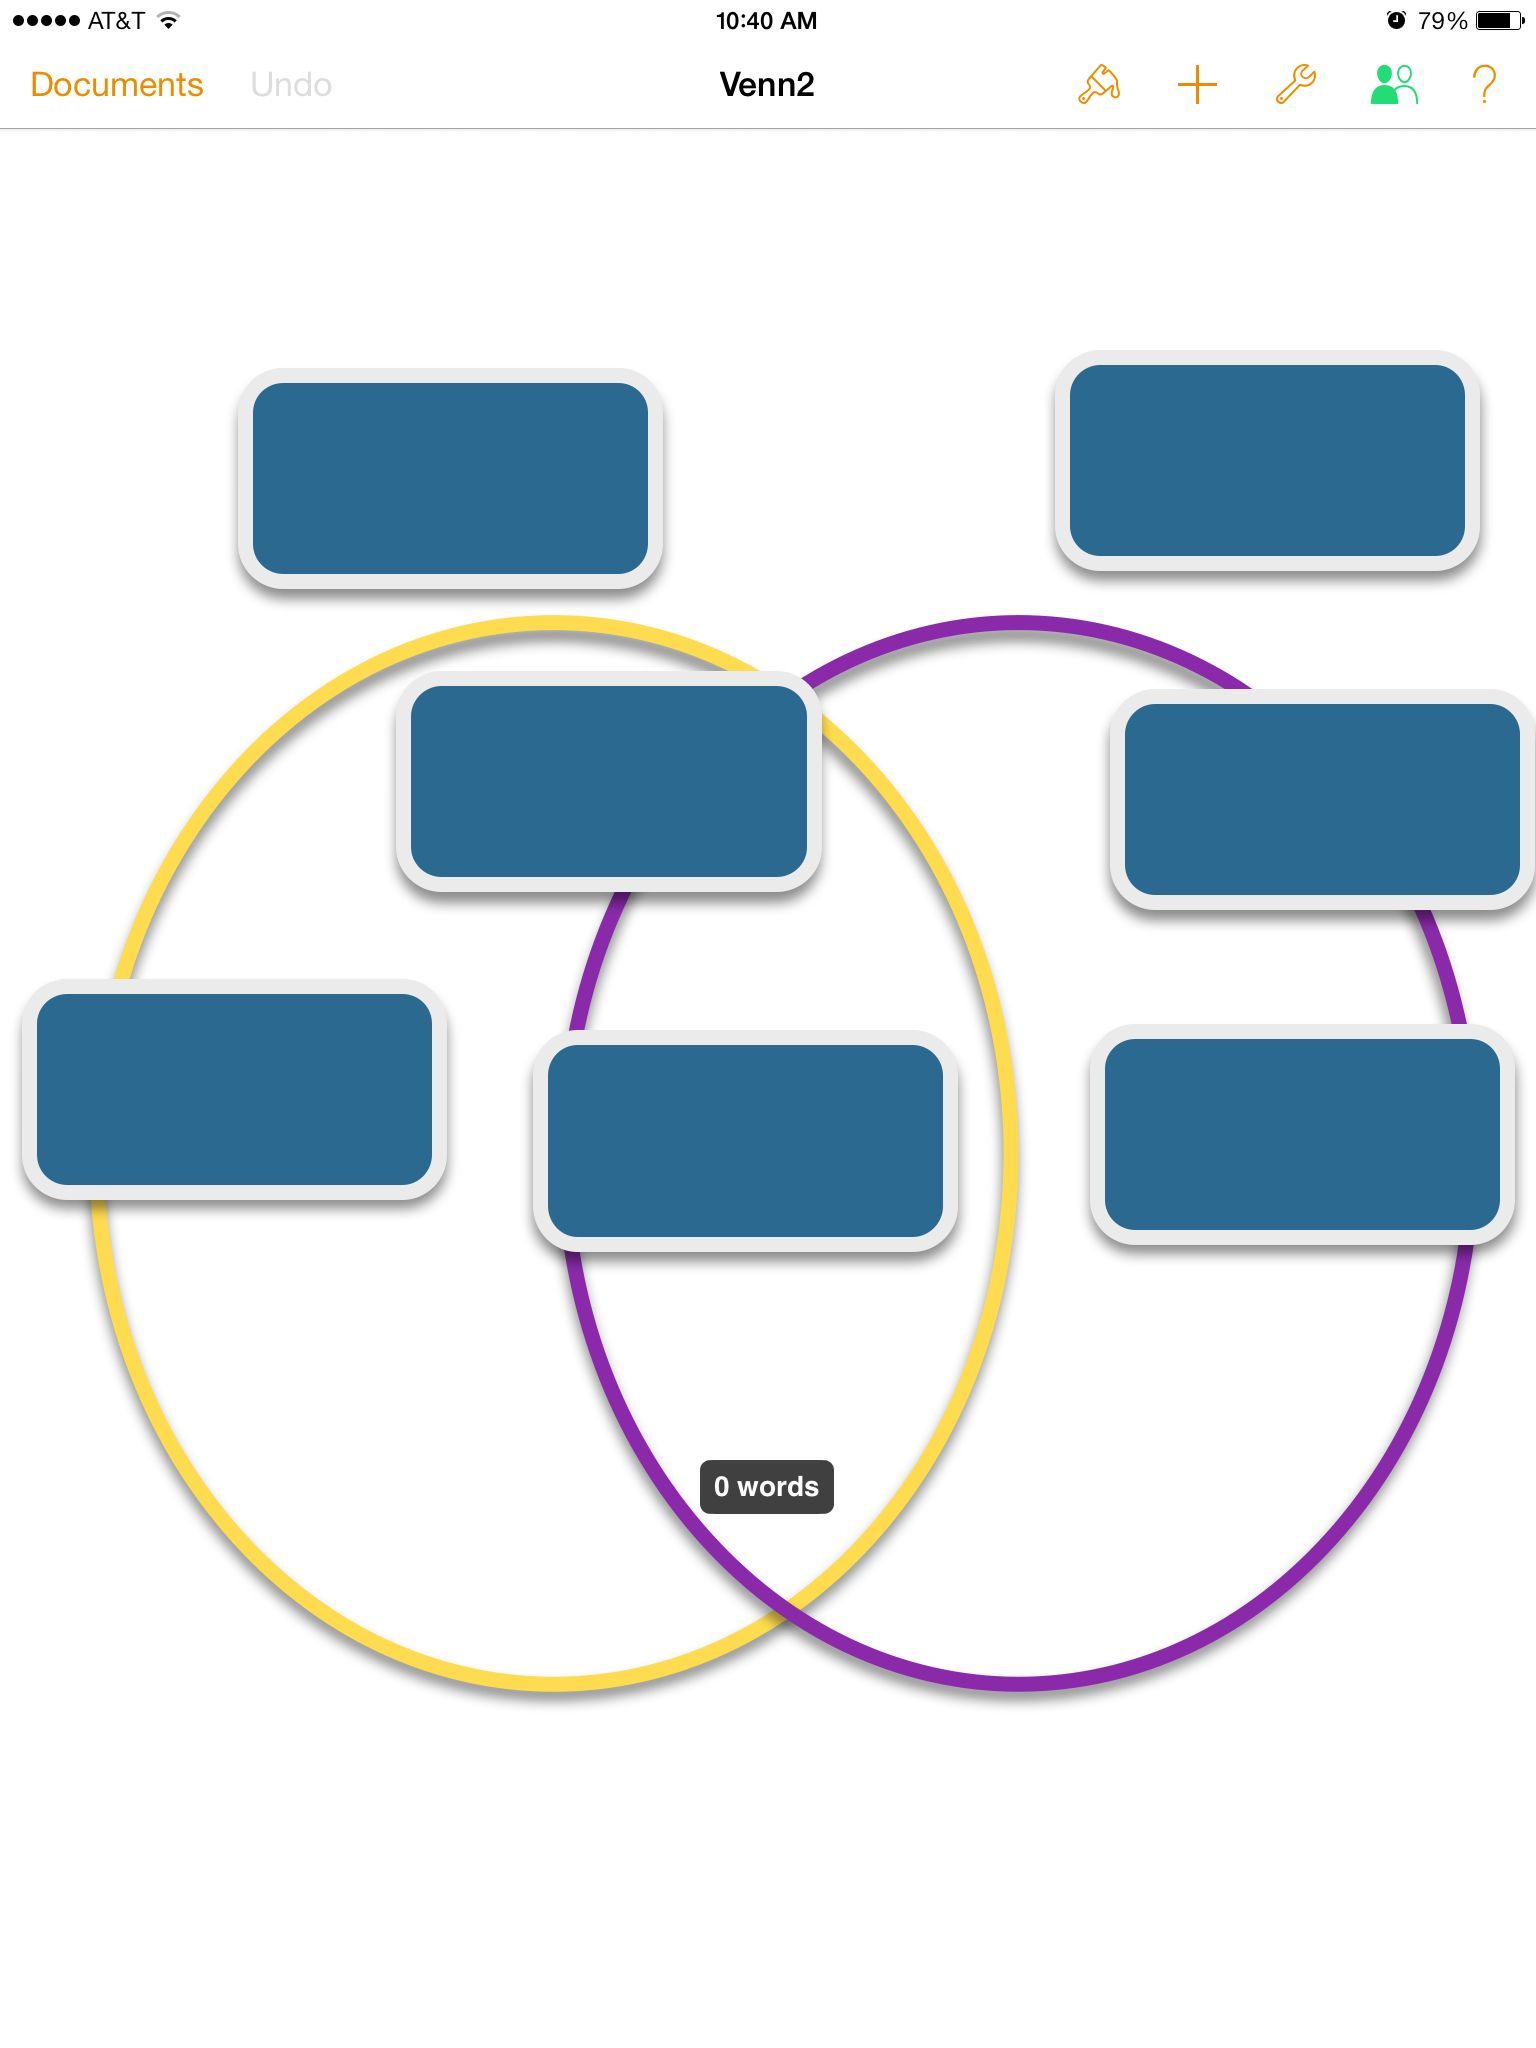 Venn diagram pages search for wiring diagrams venn diagram template for pages https www icloud com iw pages rh pinterest com venn diagram games online venn diagram games for kids ccuart Choice Image